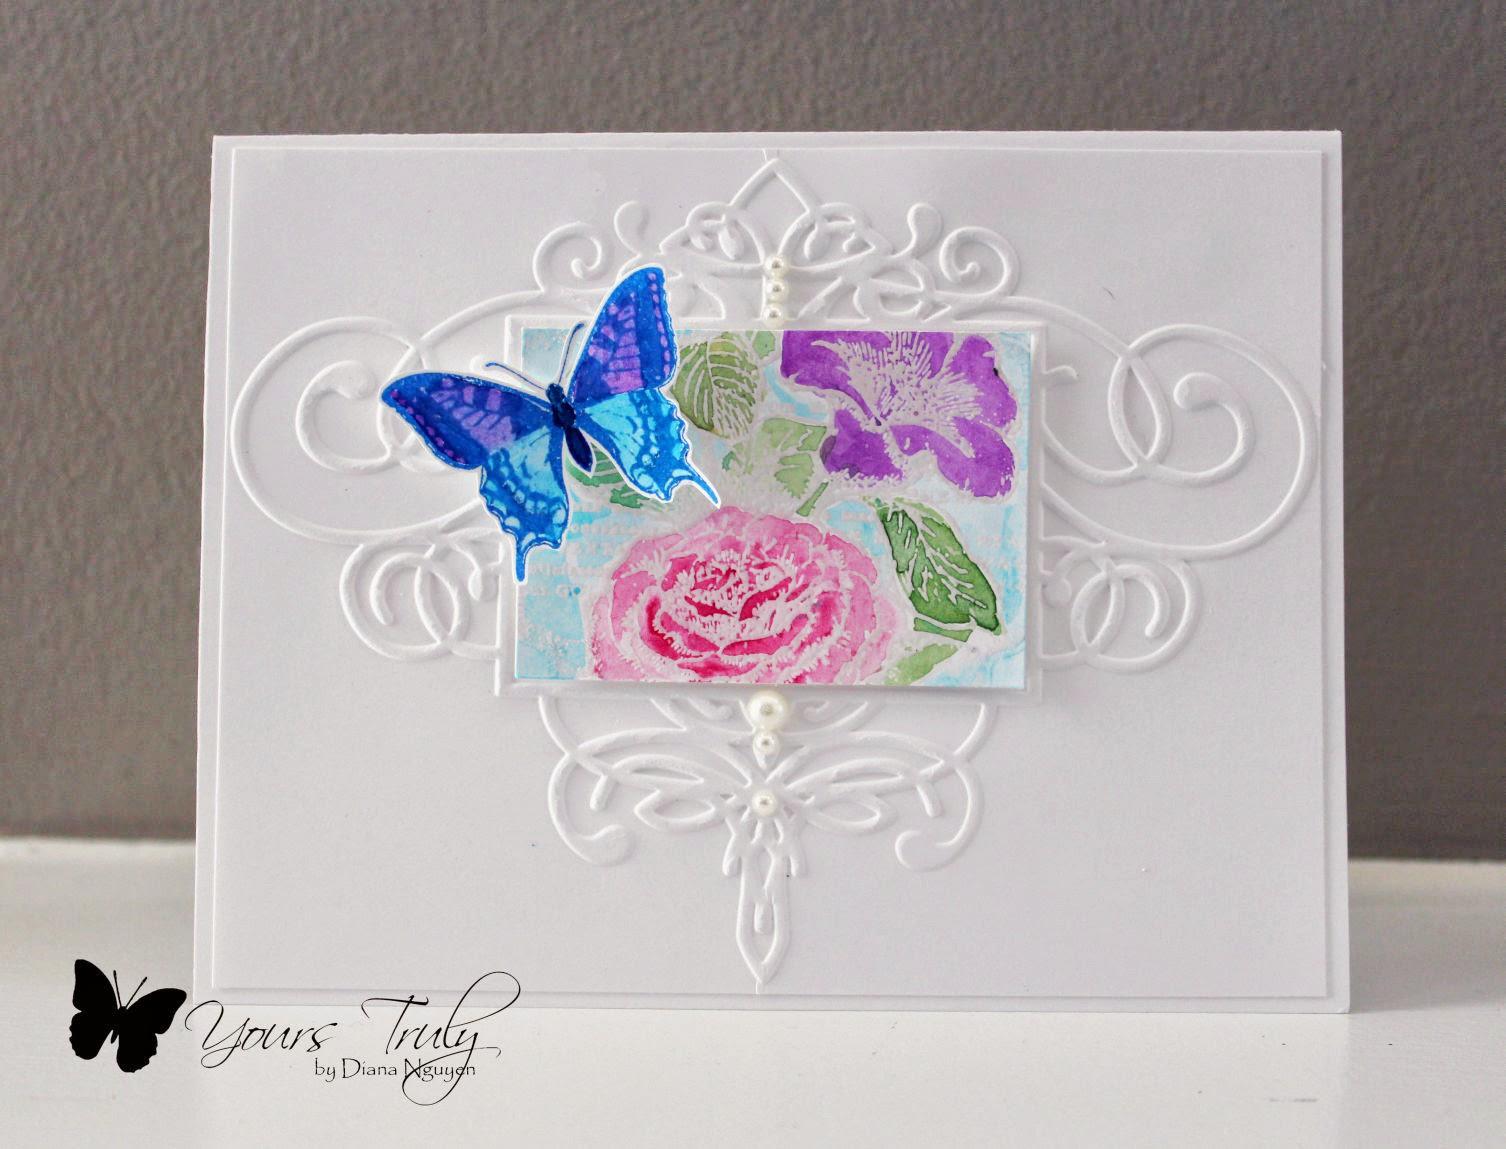 Diana Nguyen, JustRite, CAS, butterfly, card